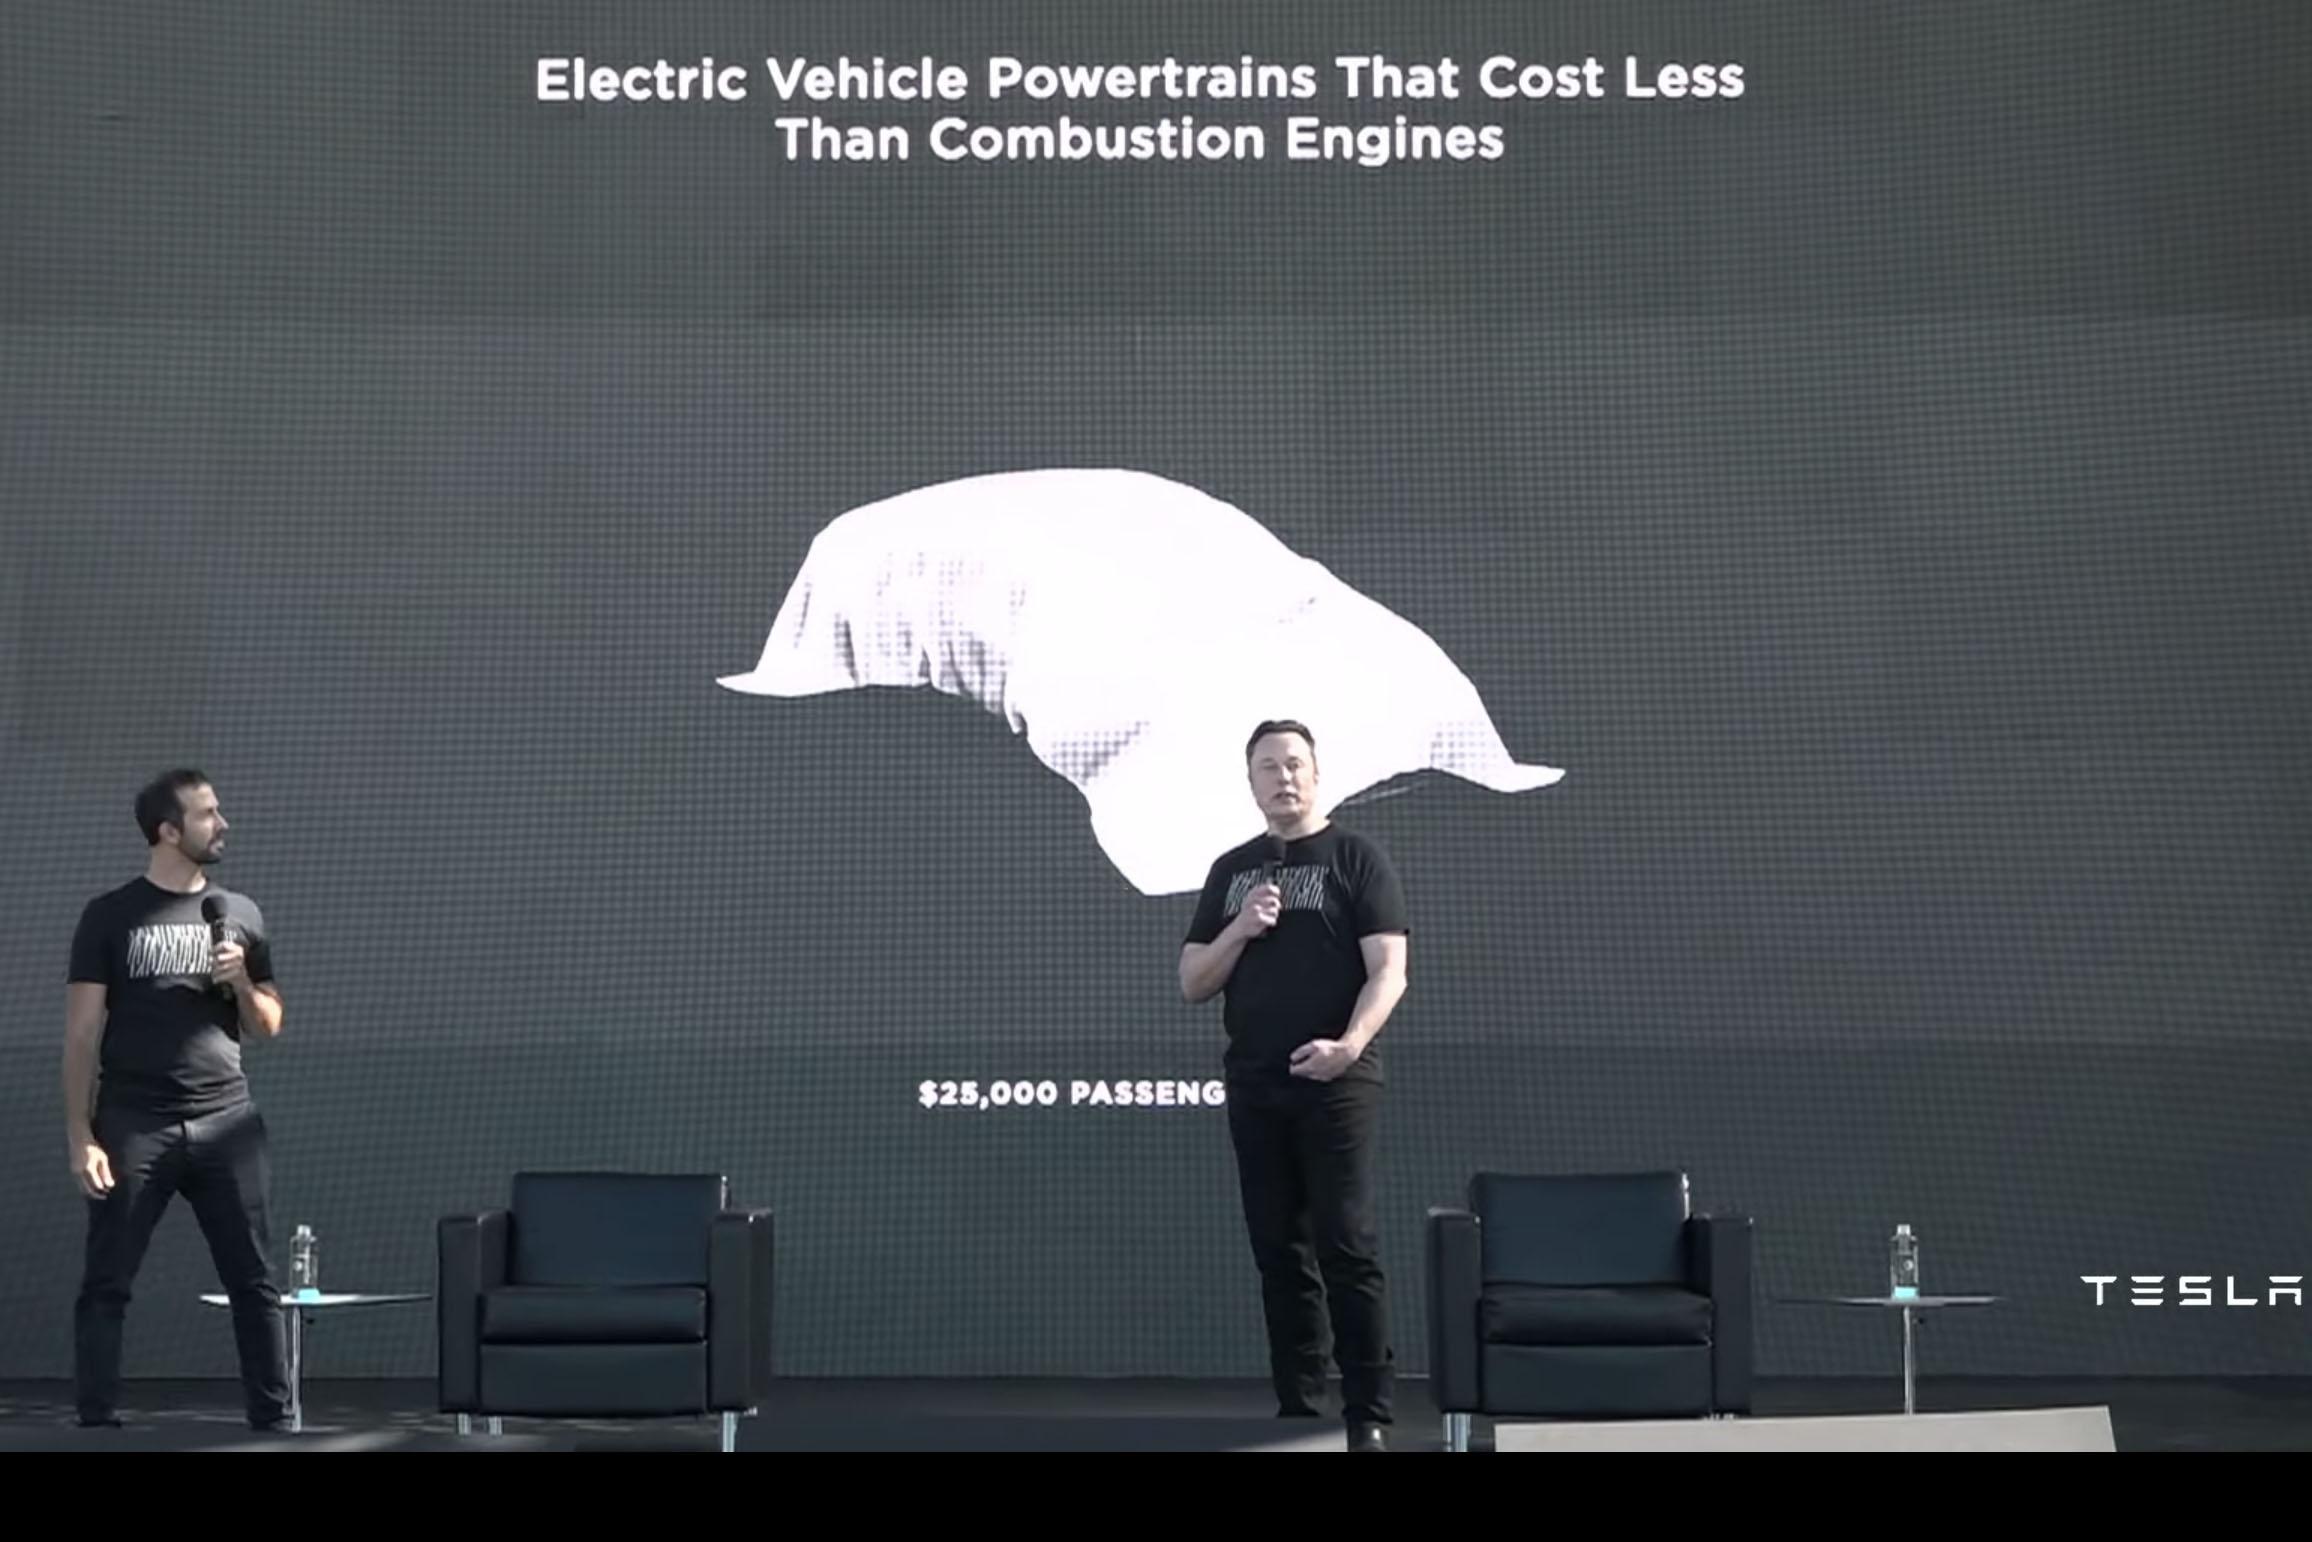 Elon Musk 預告最快 2023 年可推出售價 25,000 美元的車款。左為動力系統及能源工程副總裁 Drew Baglino。